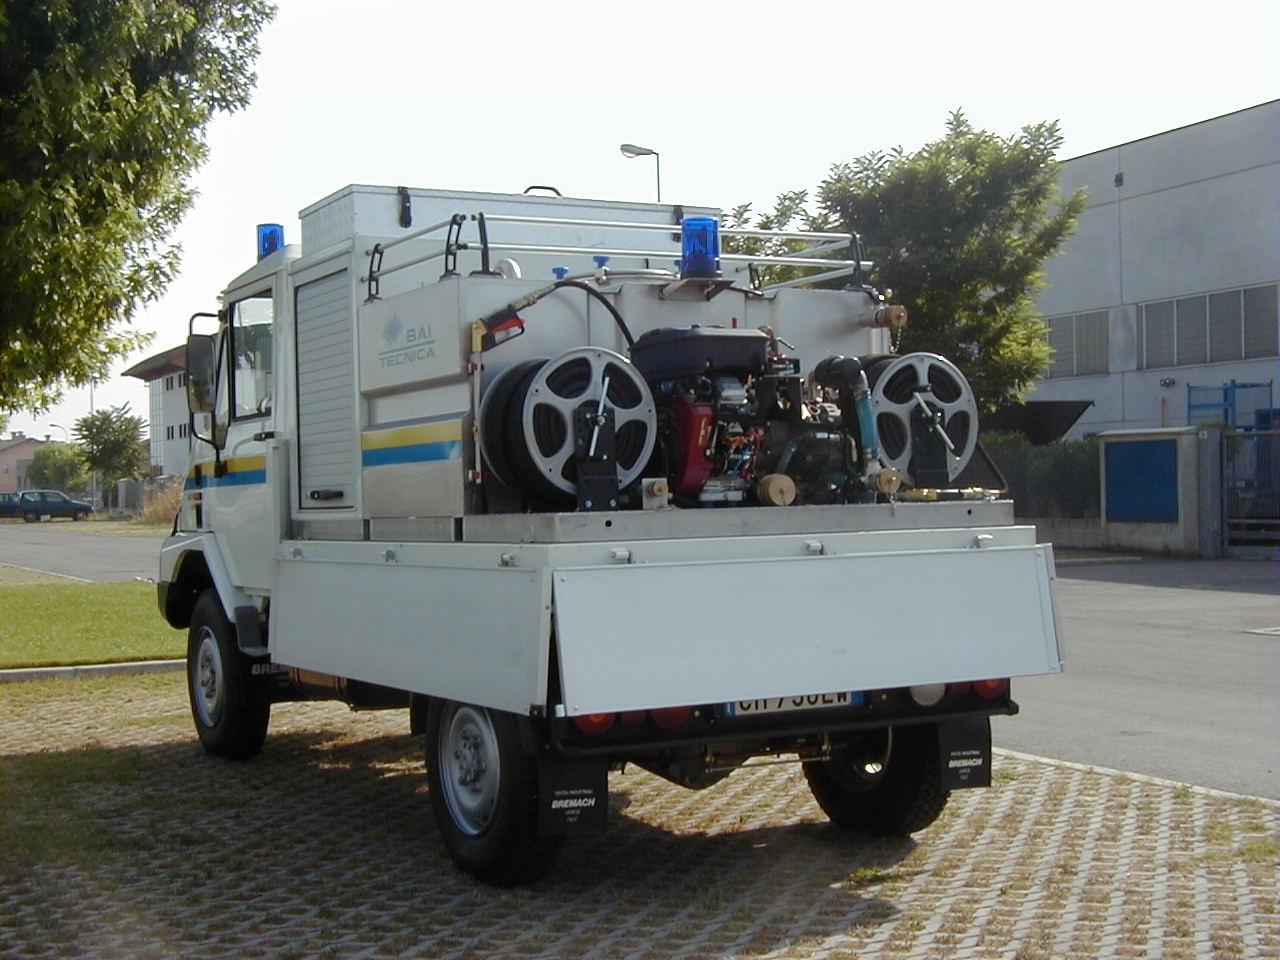 Modulo antincendio scarrabile dt-1000-pb benzina